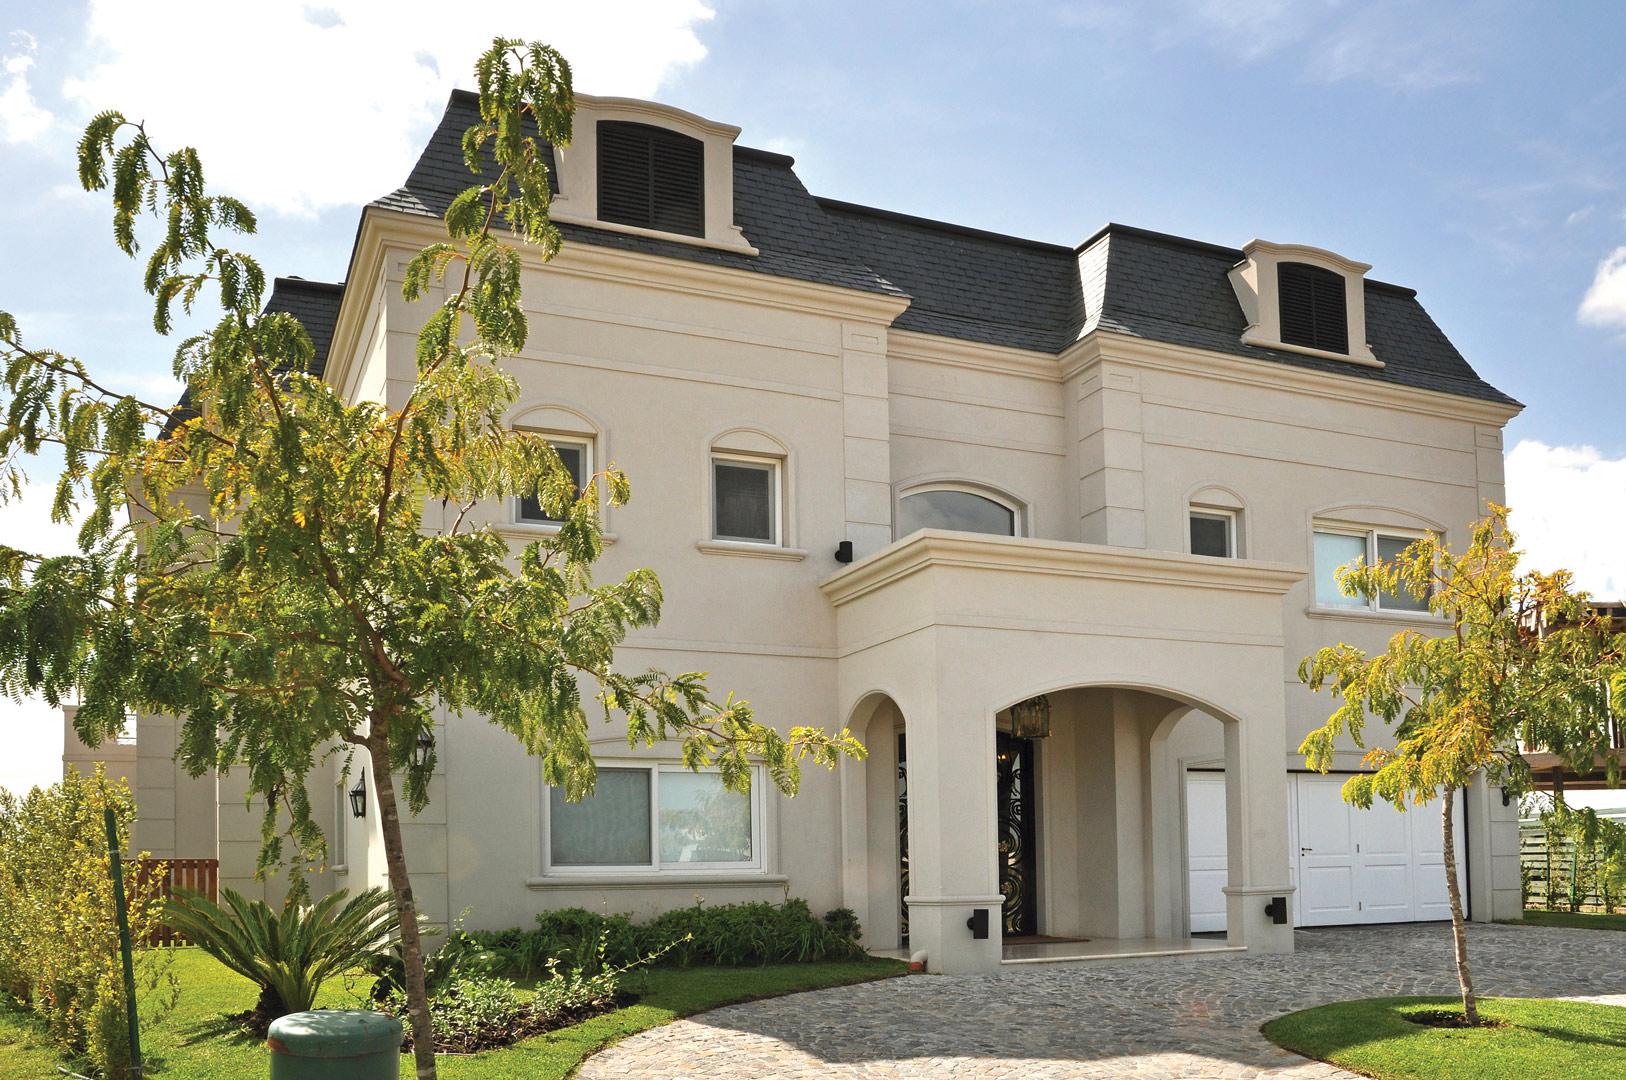 Fredi llosa y arquinova casas casa estilo cl sica for Casa vivienda jardin pdf